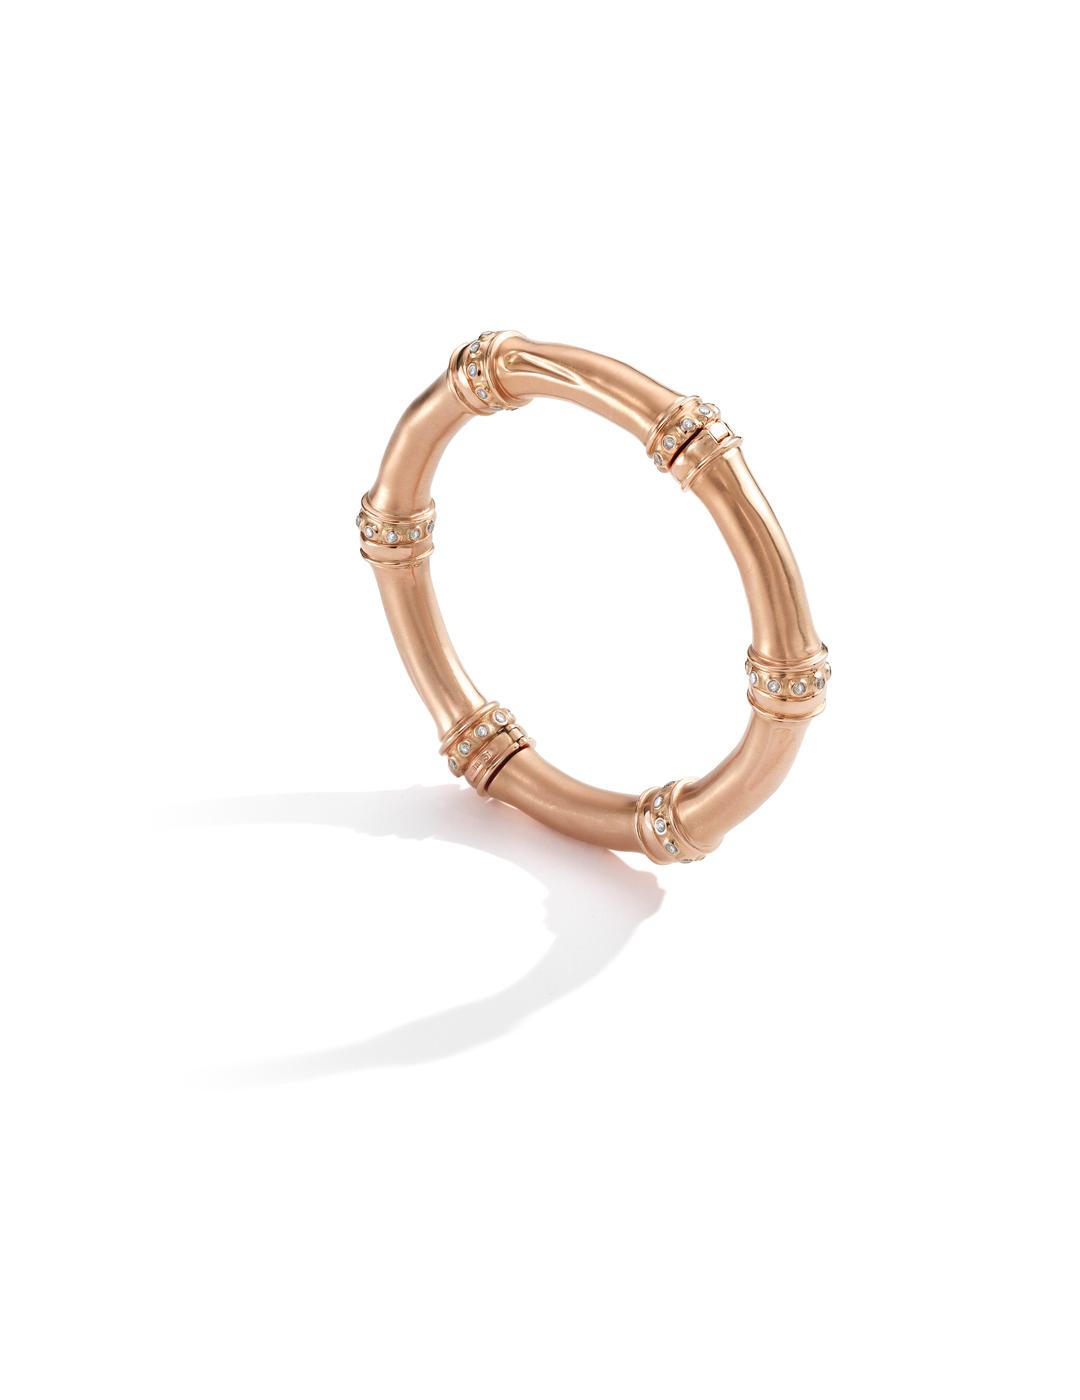 mish_jewelry_product_Jungle-Bamboo-RG-Bangle-1